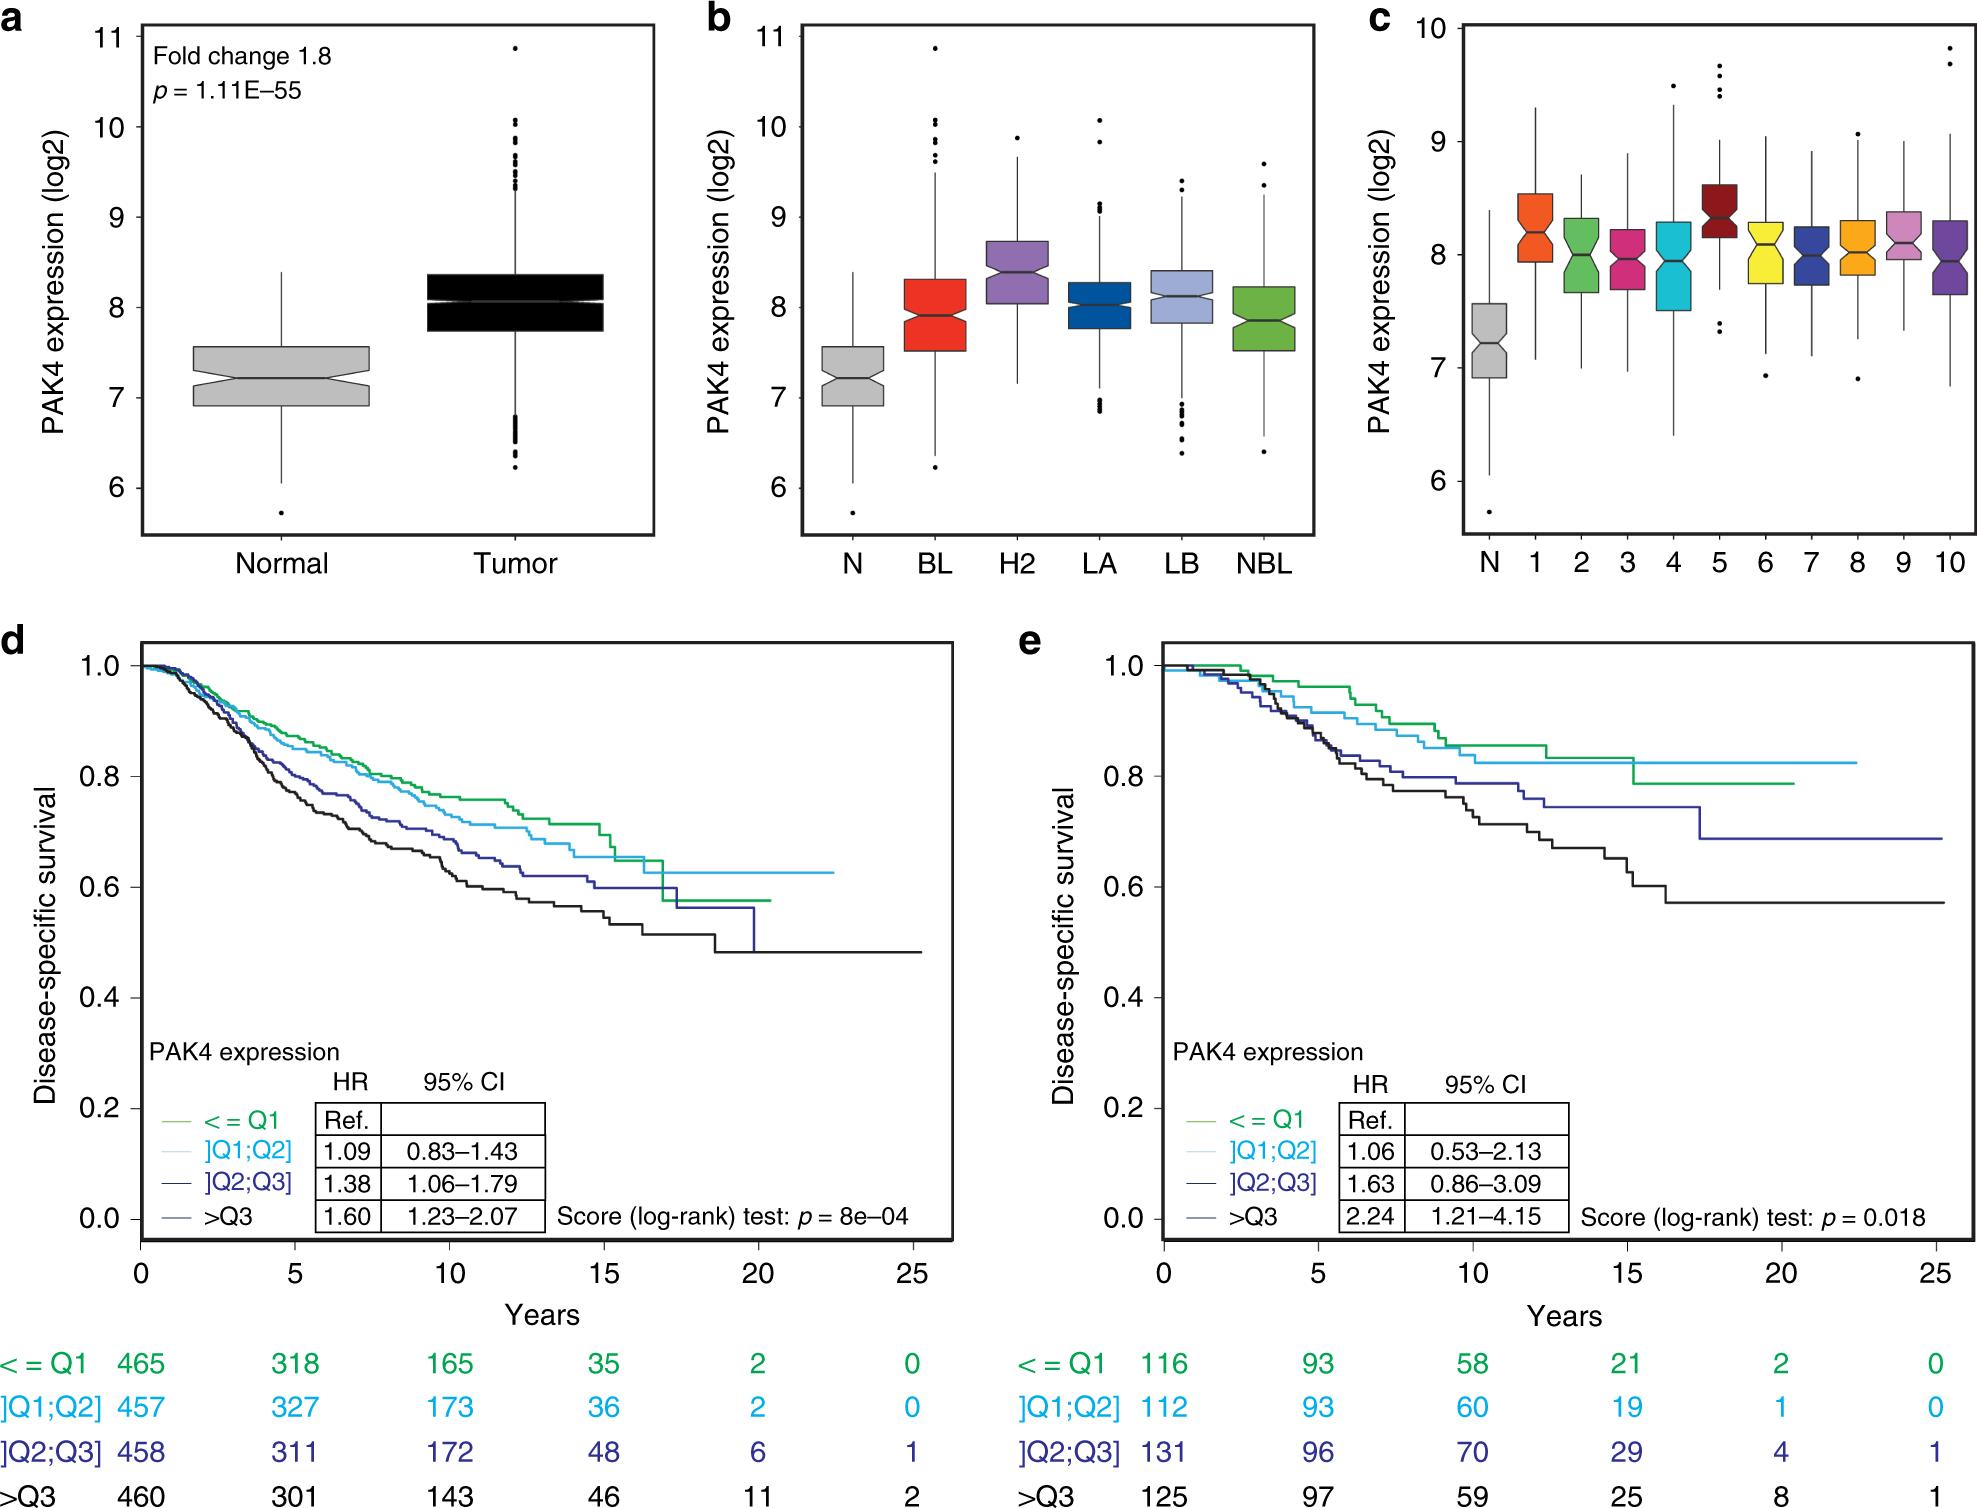 PAK4 suppresses RELB to prevent senescence-like growth